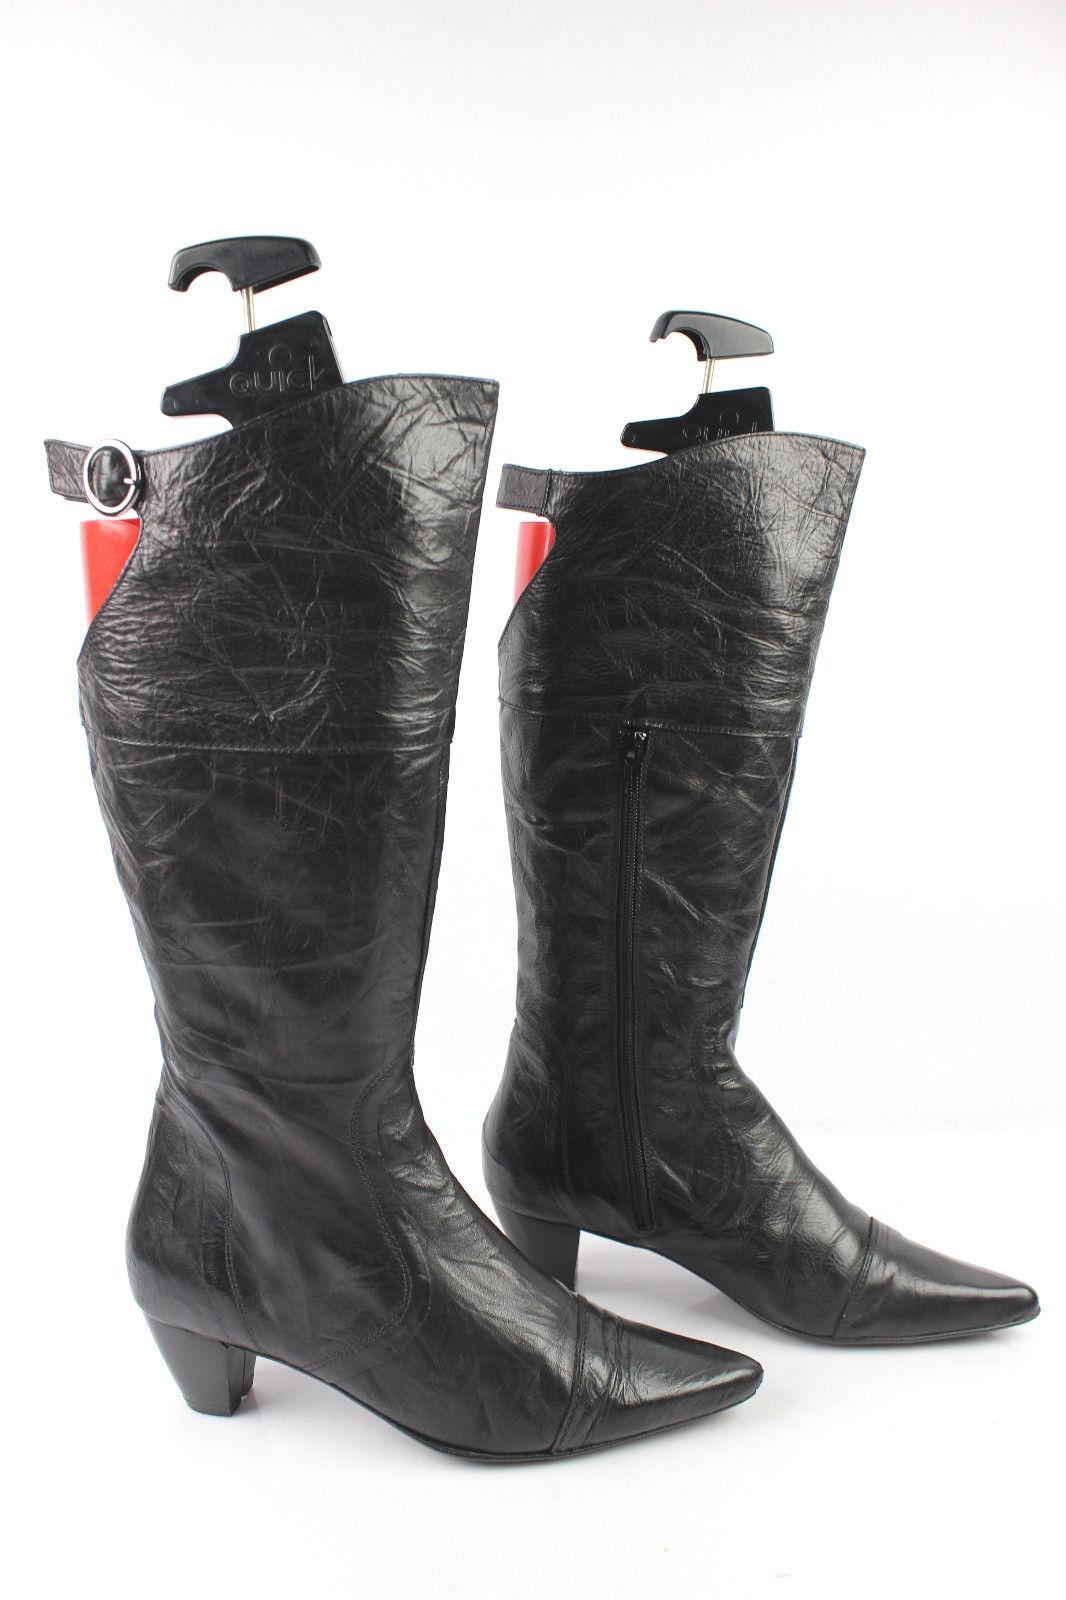 Stiefel 2D2 DOSDEDOS schwarzes Leder Kälber Überziehungen t 38